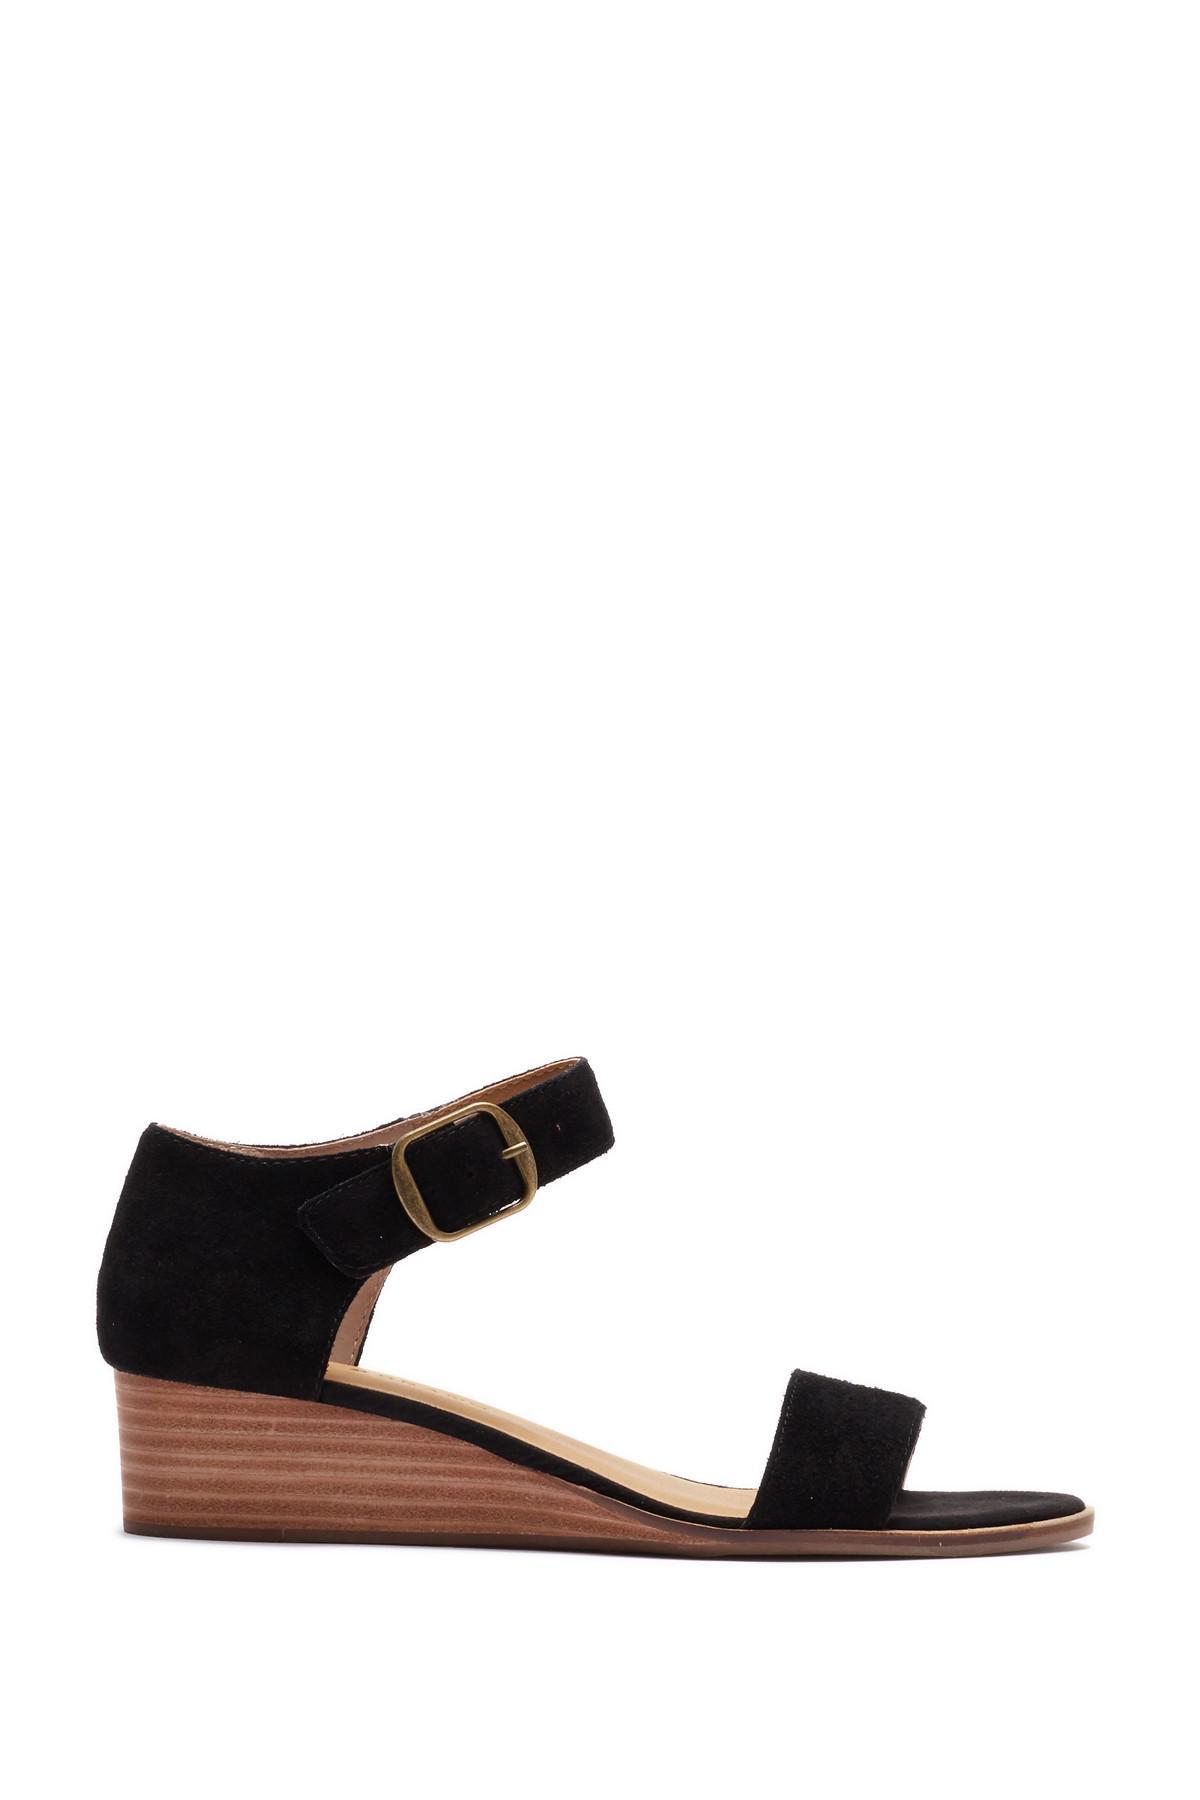 498e8da3135 Lyst - Lucky Brand Renzee Platform Sandal in Black